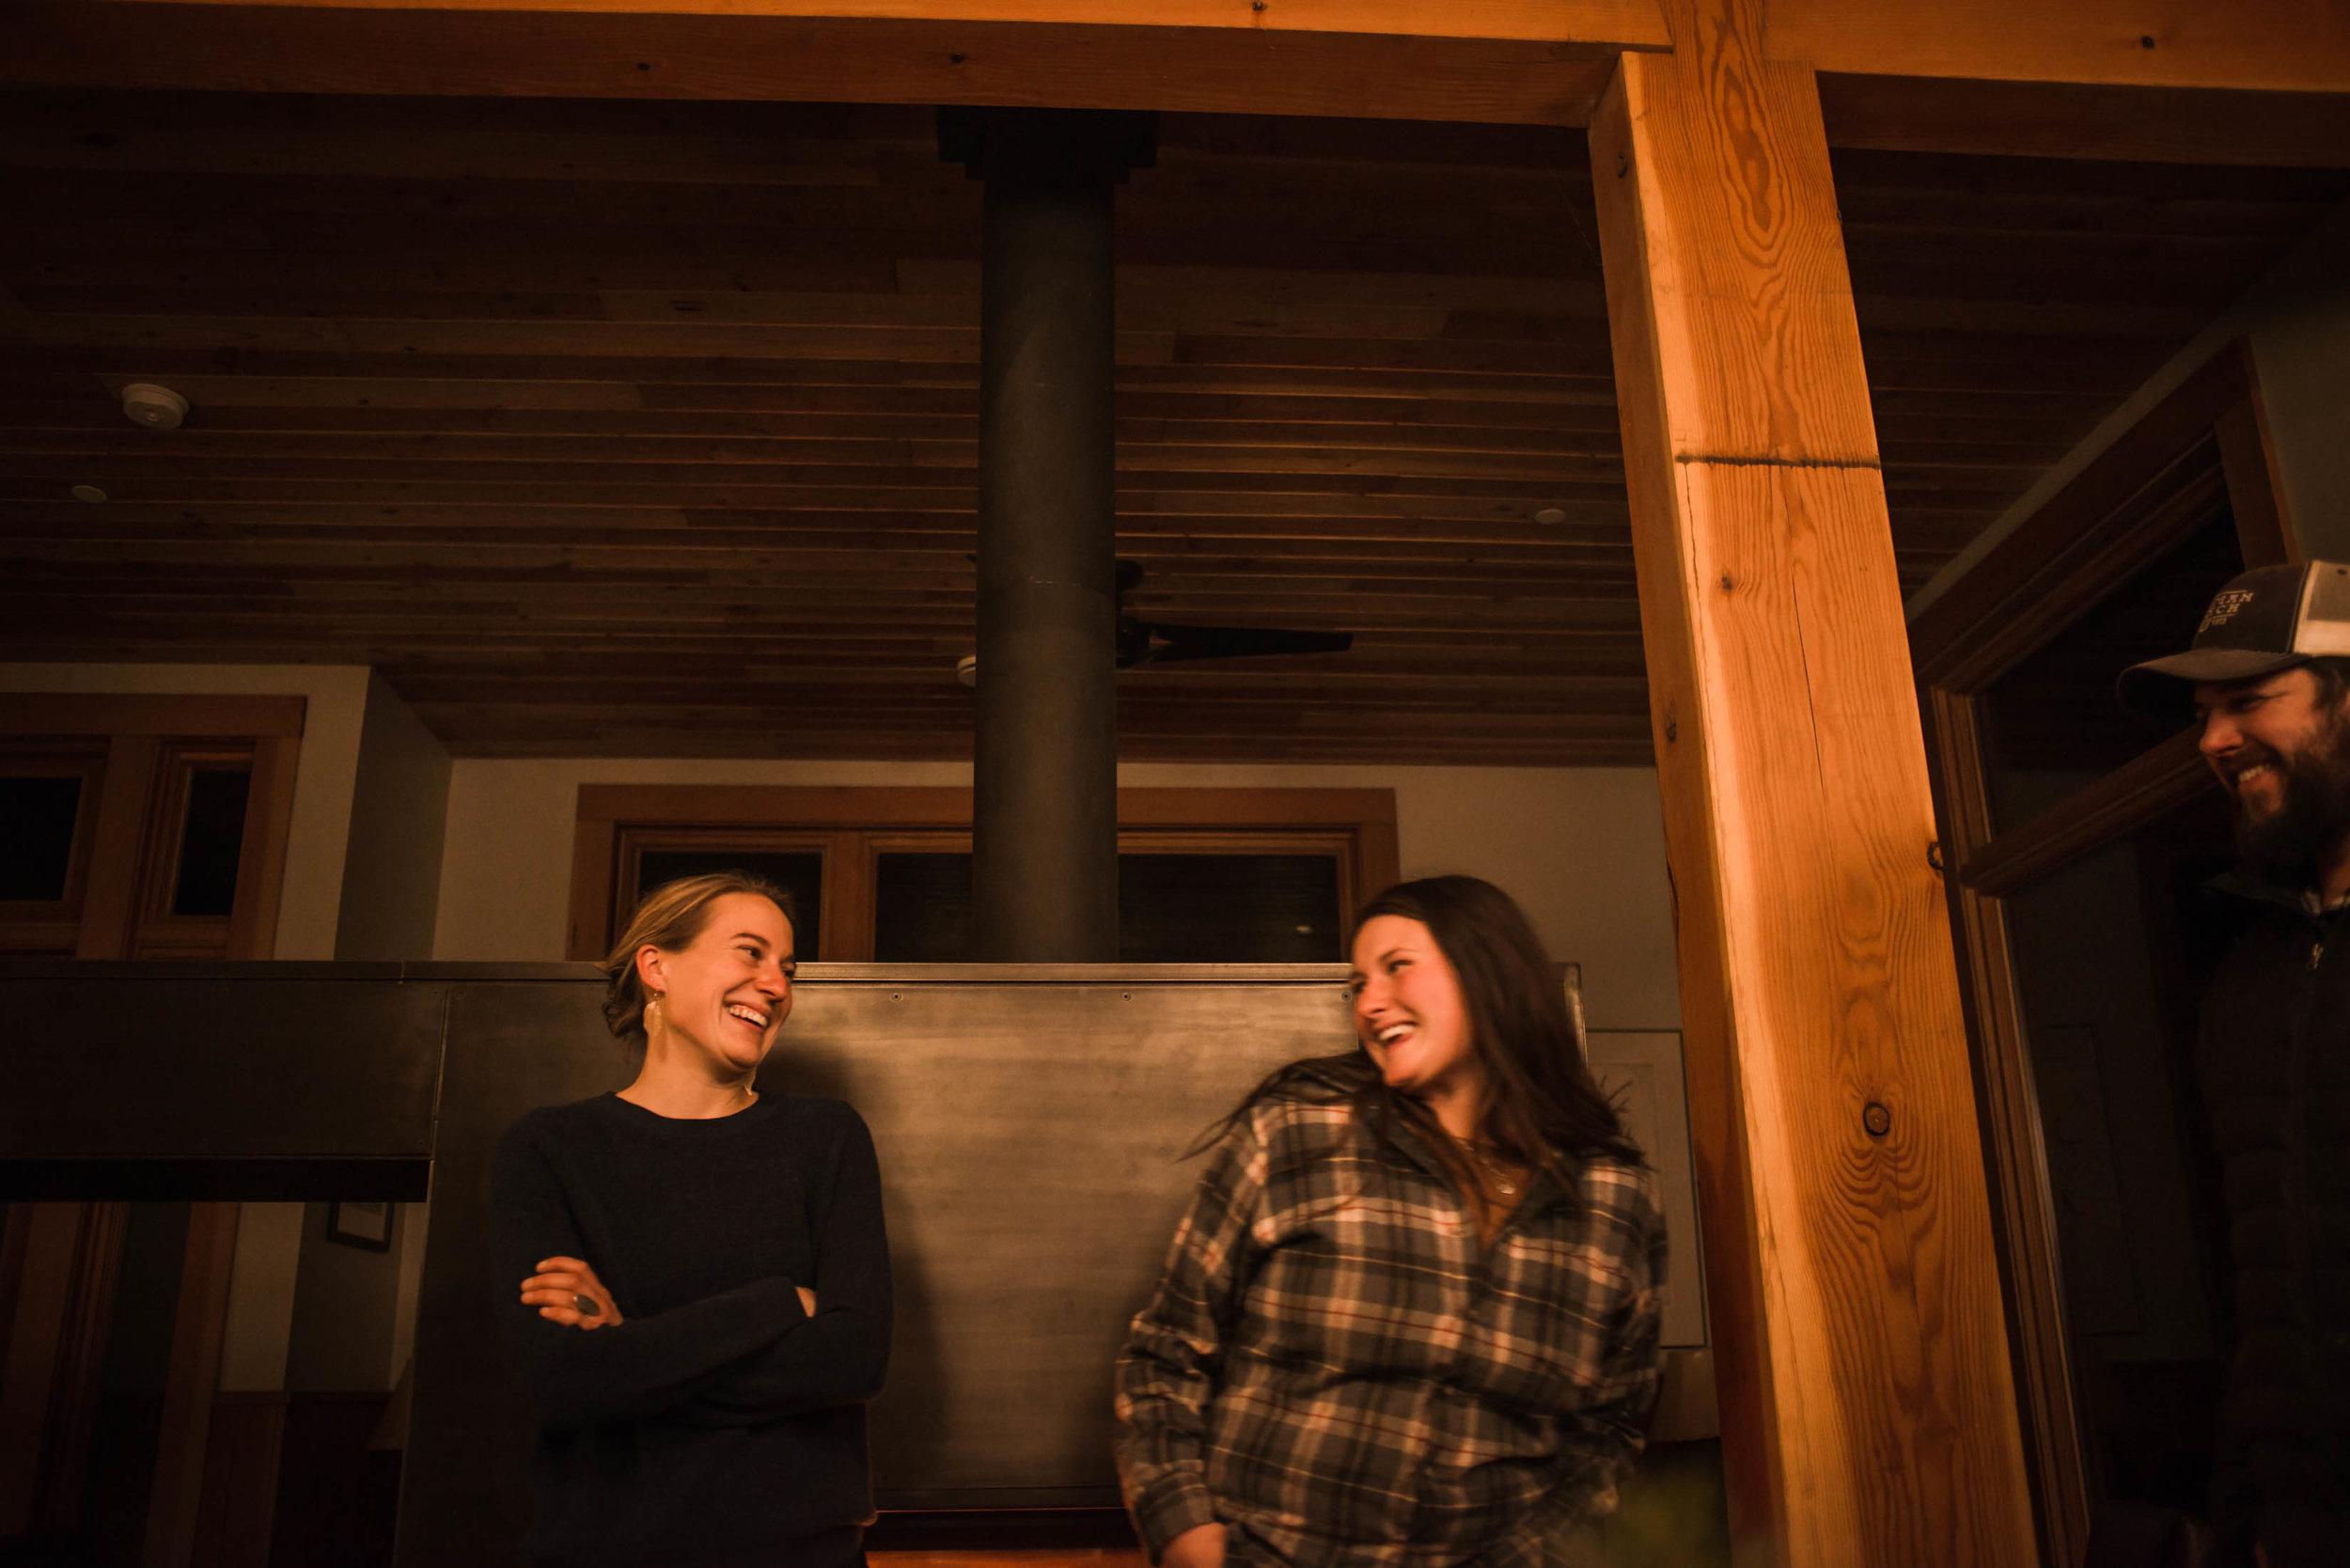 Minam_River_Lodge_Wallowa_Mountains_Eagle_Cap_Wilderness_Oregon_Autumn_2017_Please_Credit_Talia_Jean_Galvin-42.jpg